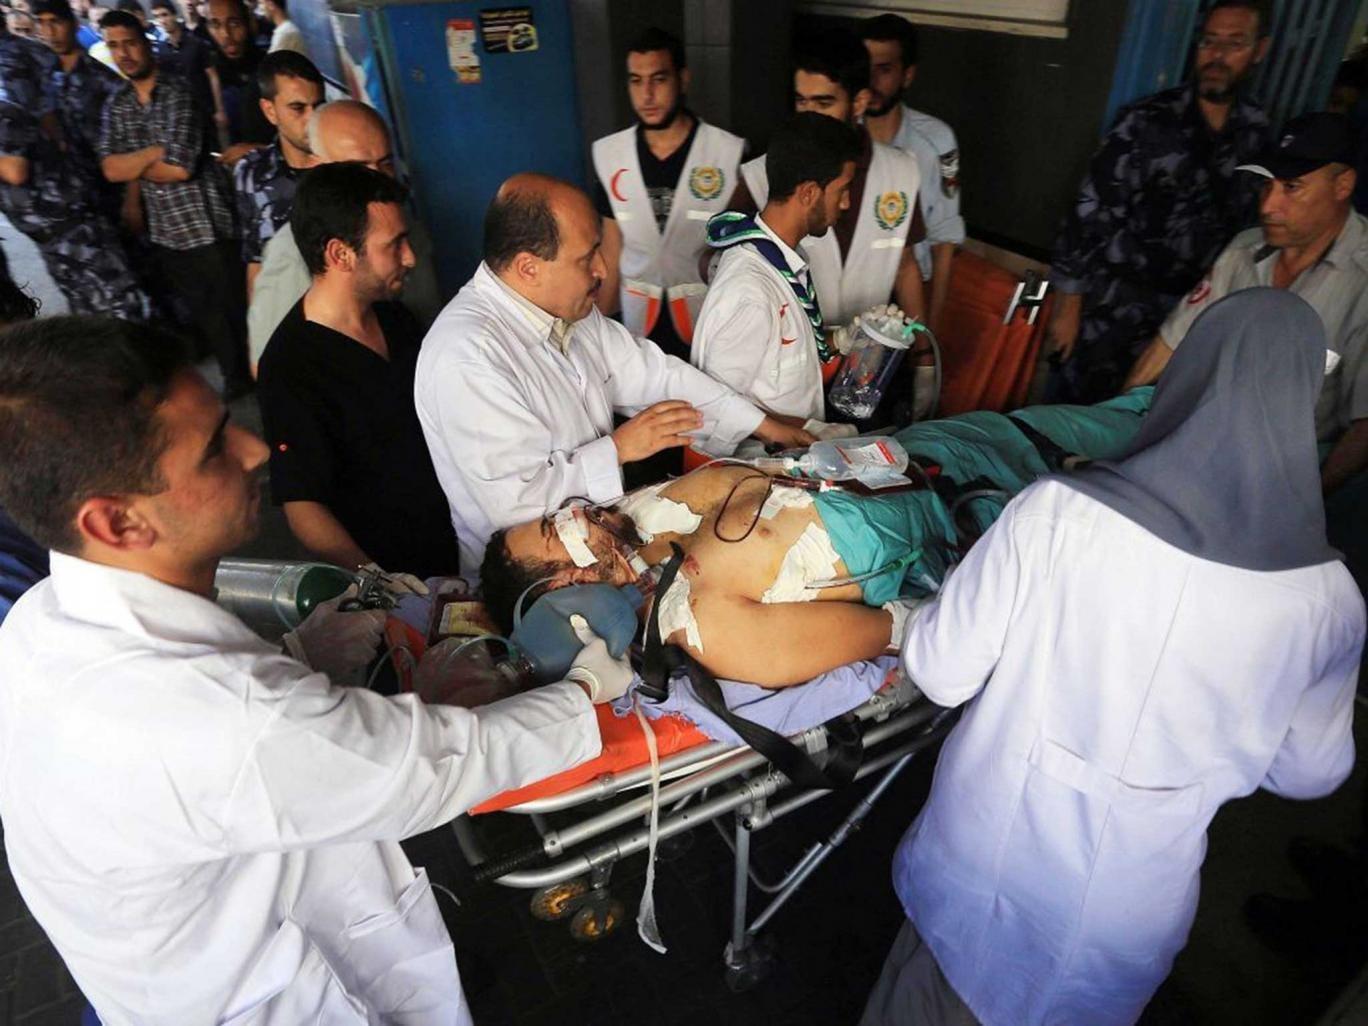 Doctors at Al‑Shifa hospital in Gaza City attempt to treat victims of Israeli air strikes